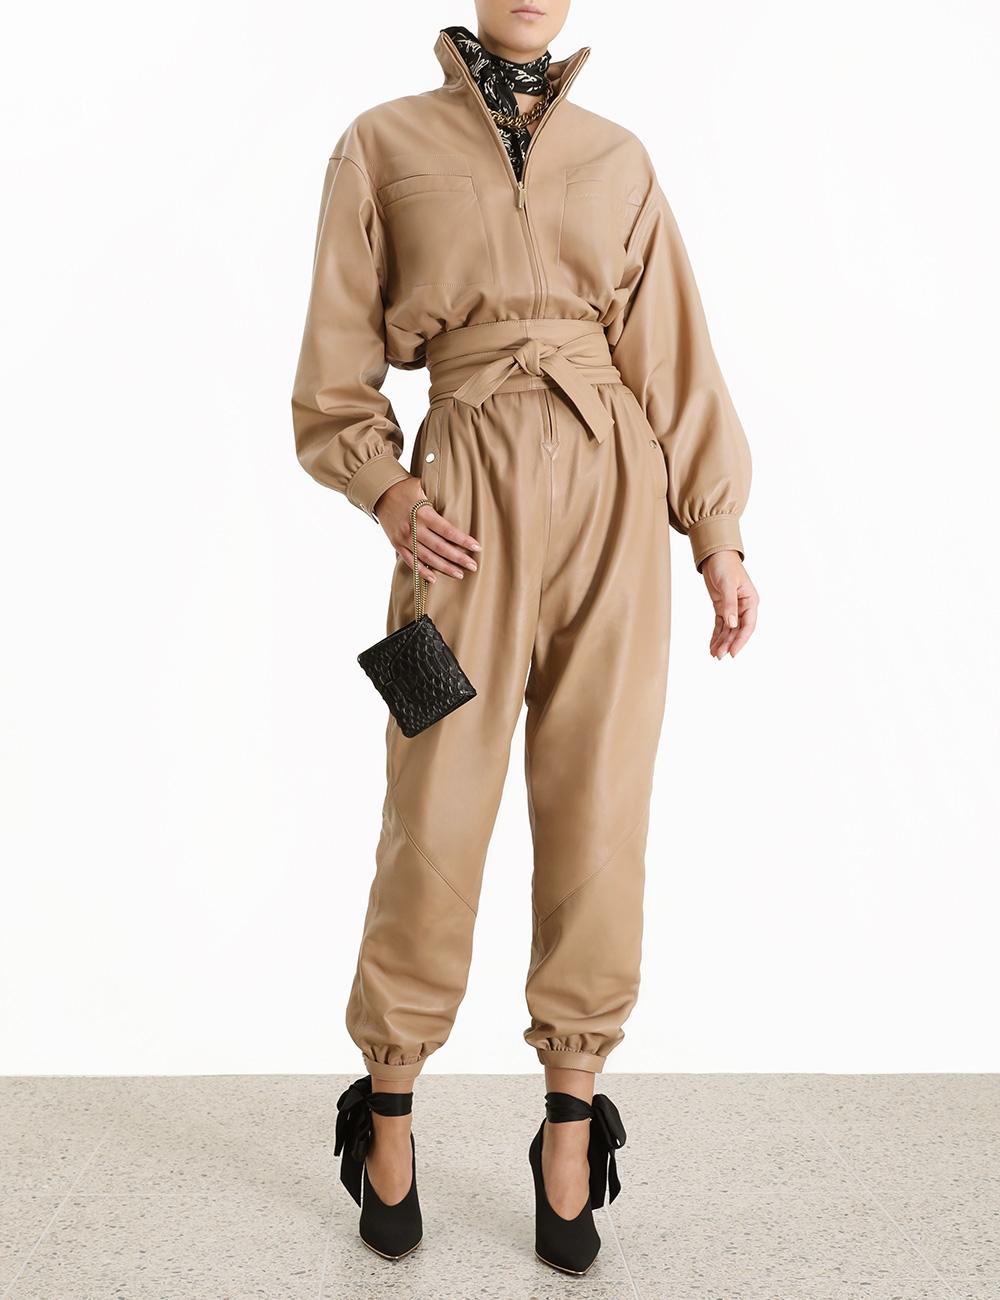 Espionage Leather Boiler Suit